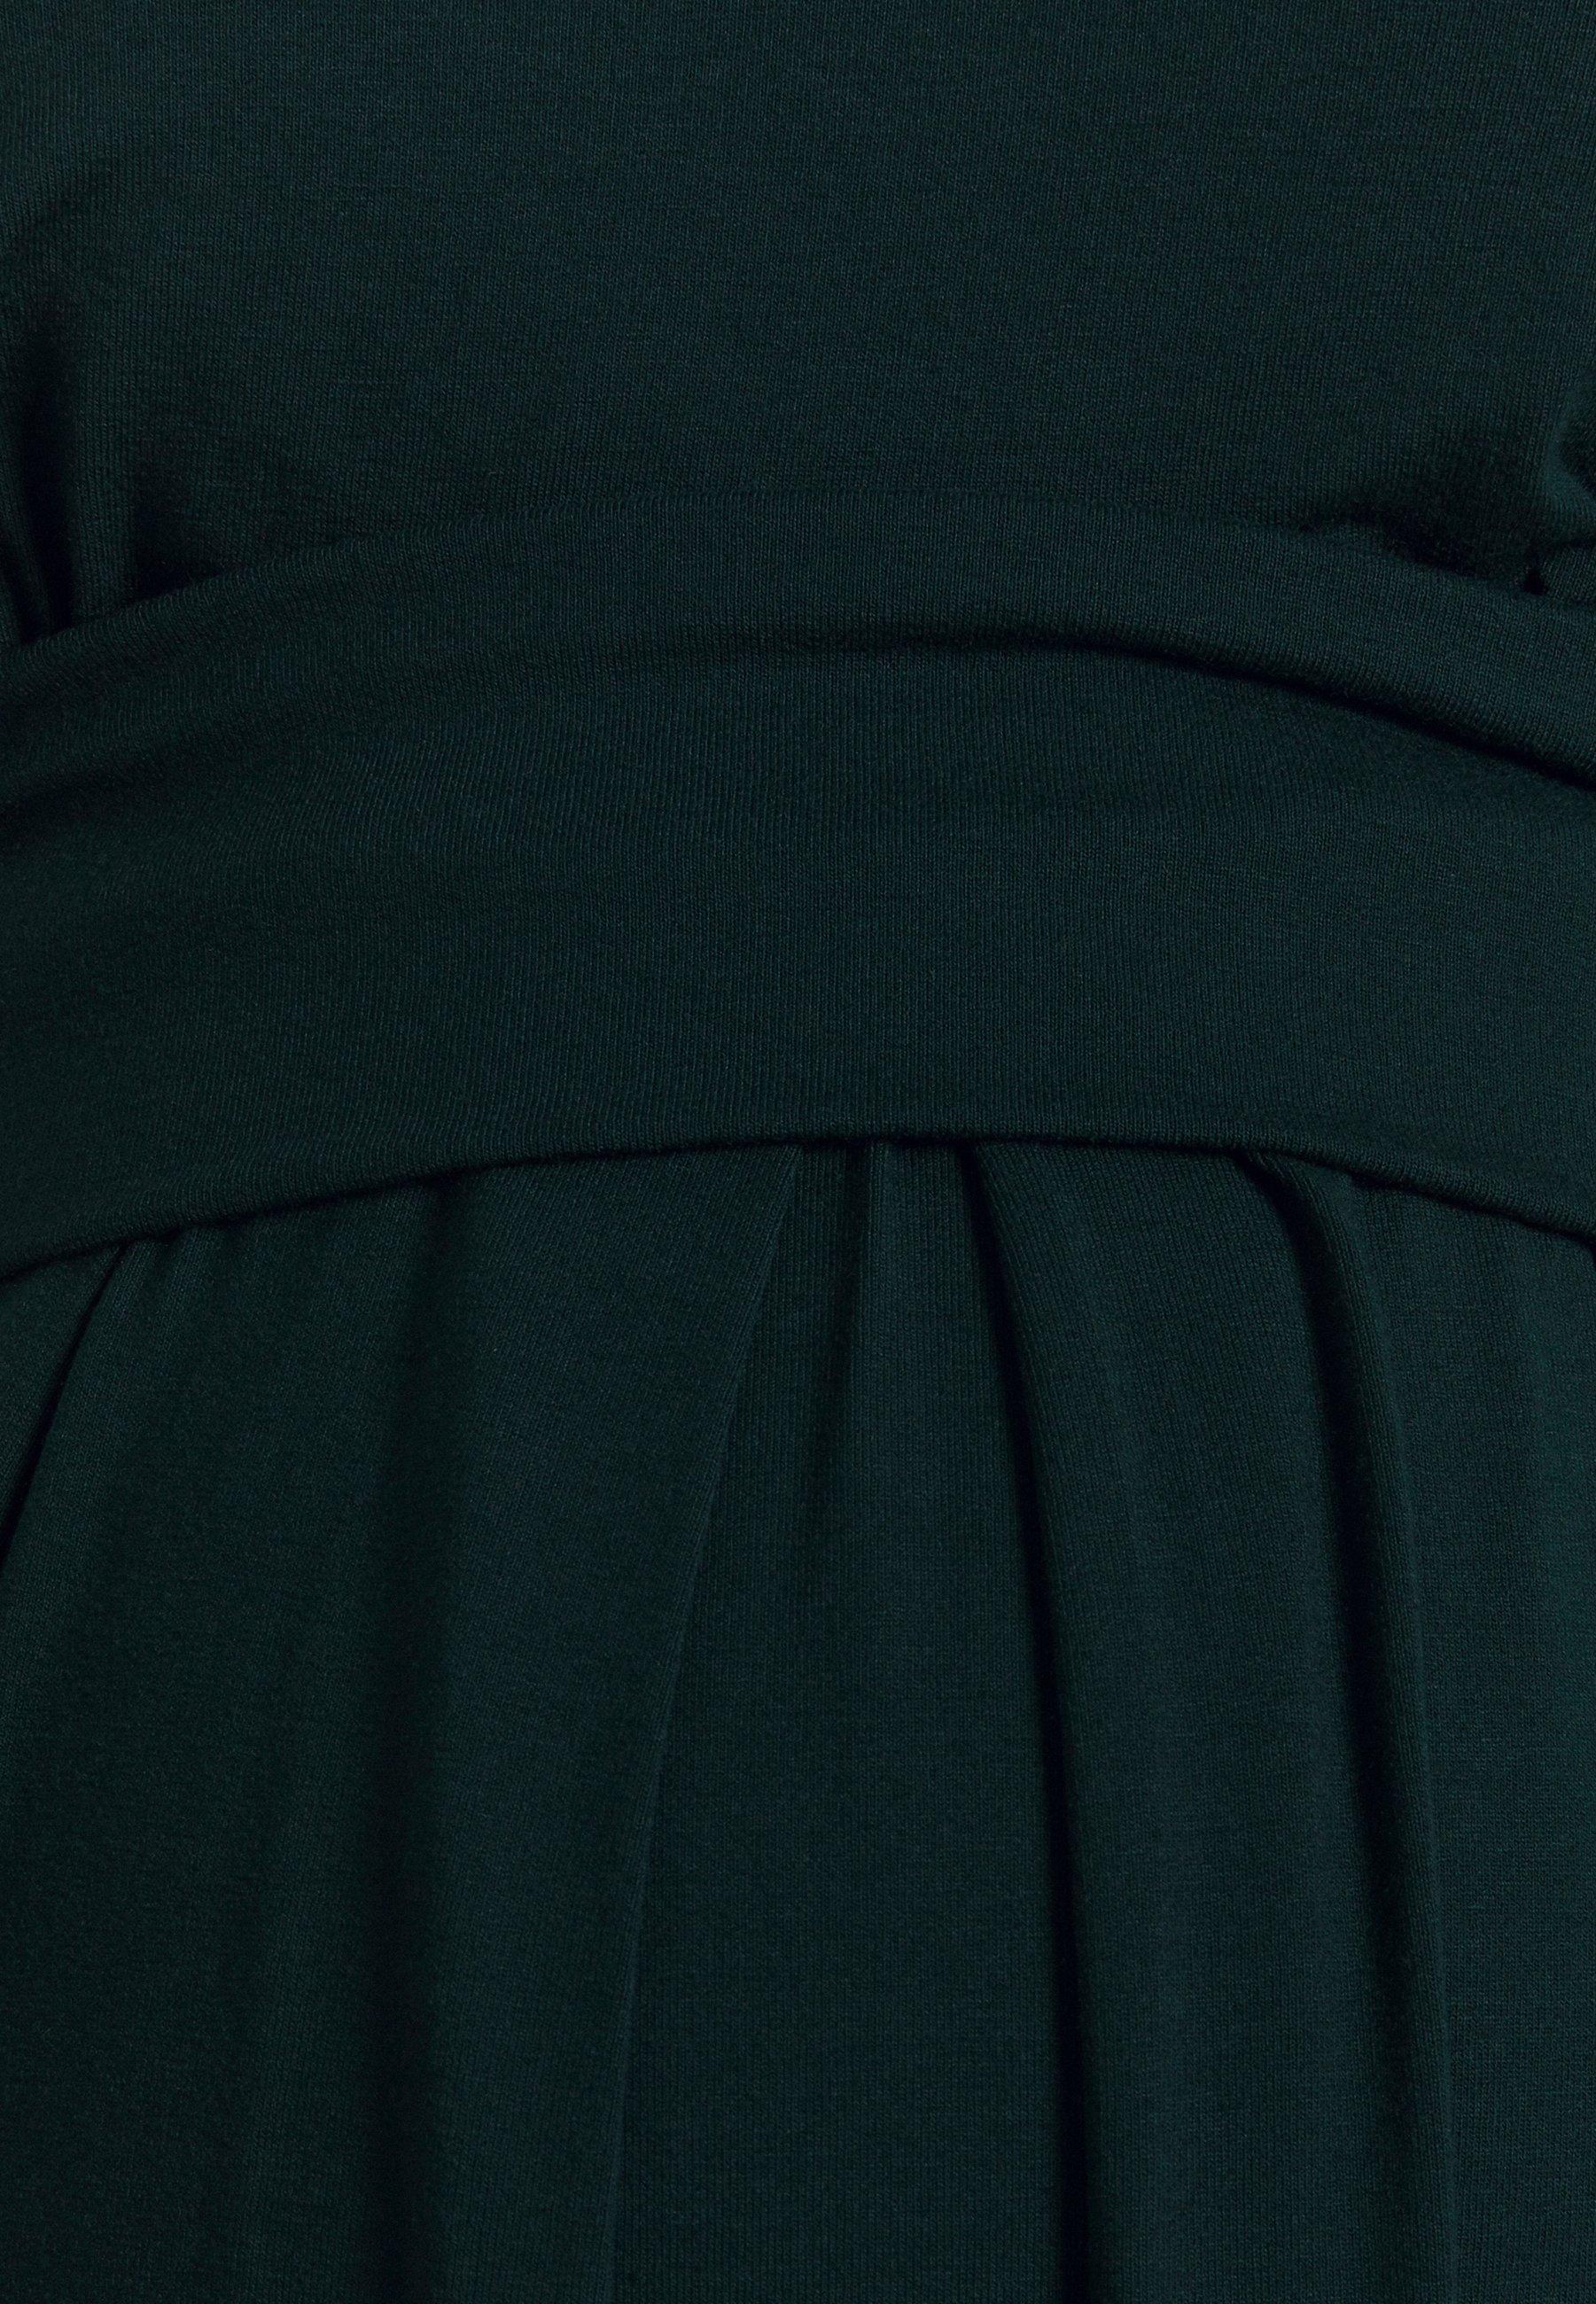 Seraphine PEACHEY Jerseykleid emerald/dunkelgrün